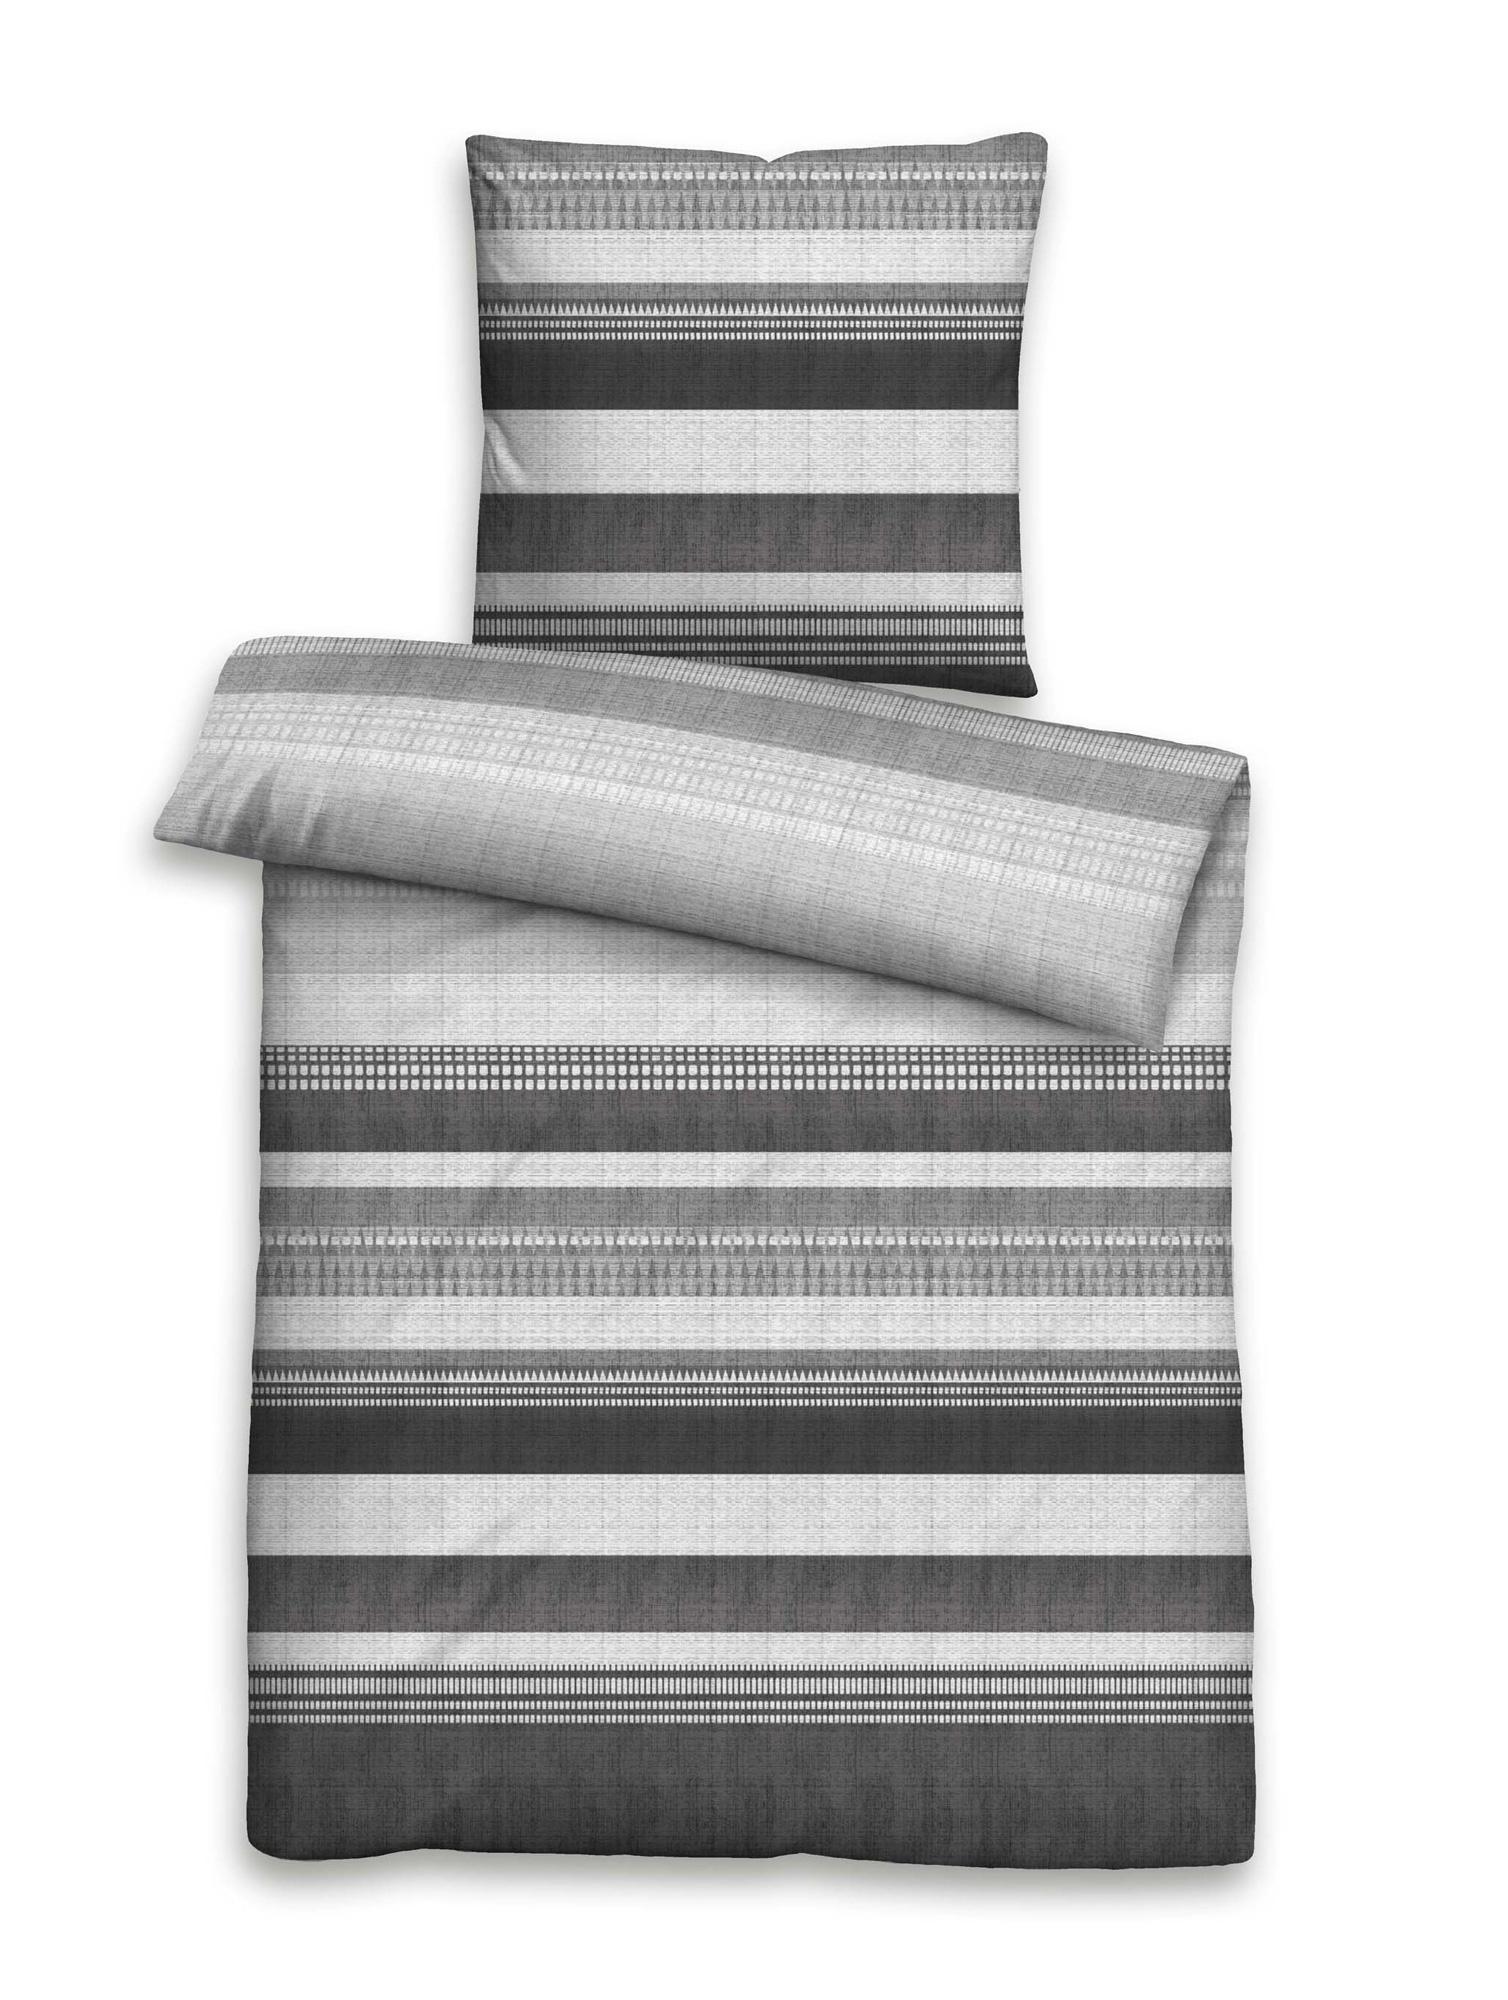 biberna mako baumwoll satinbettw sche 135x200 80x80 titanium. Black Bedroom Furniture Sets. Home Design Ideas